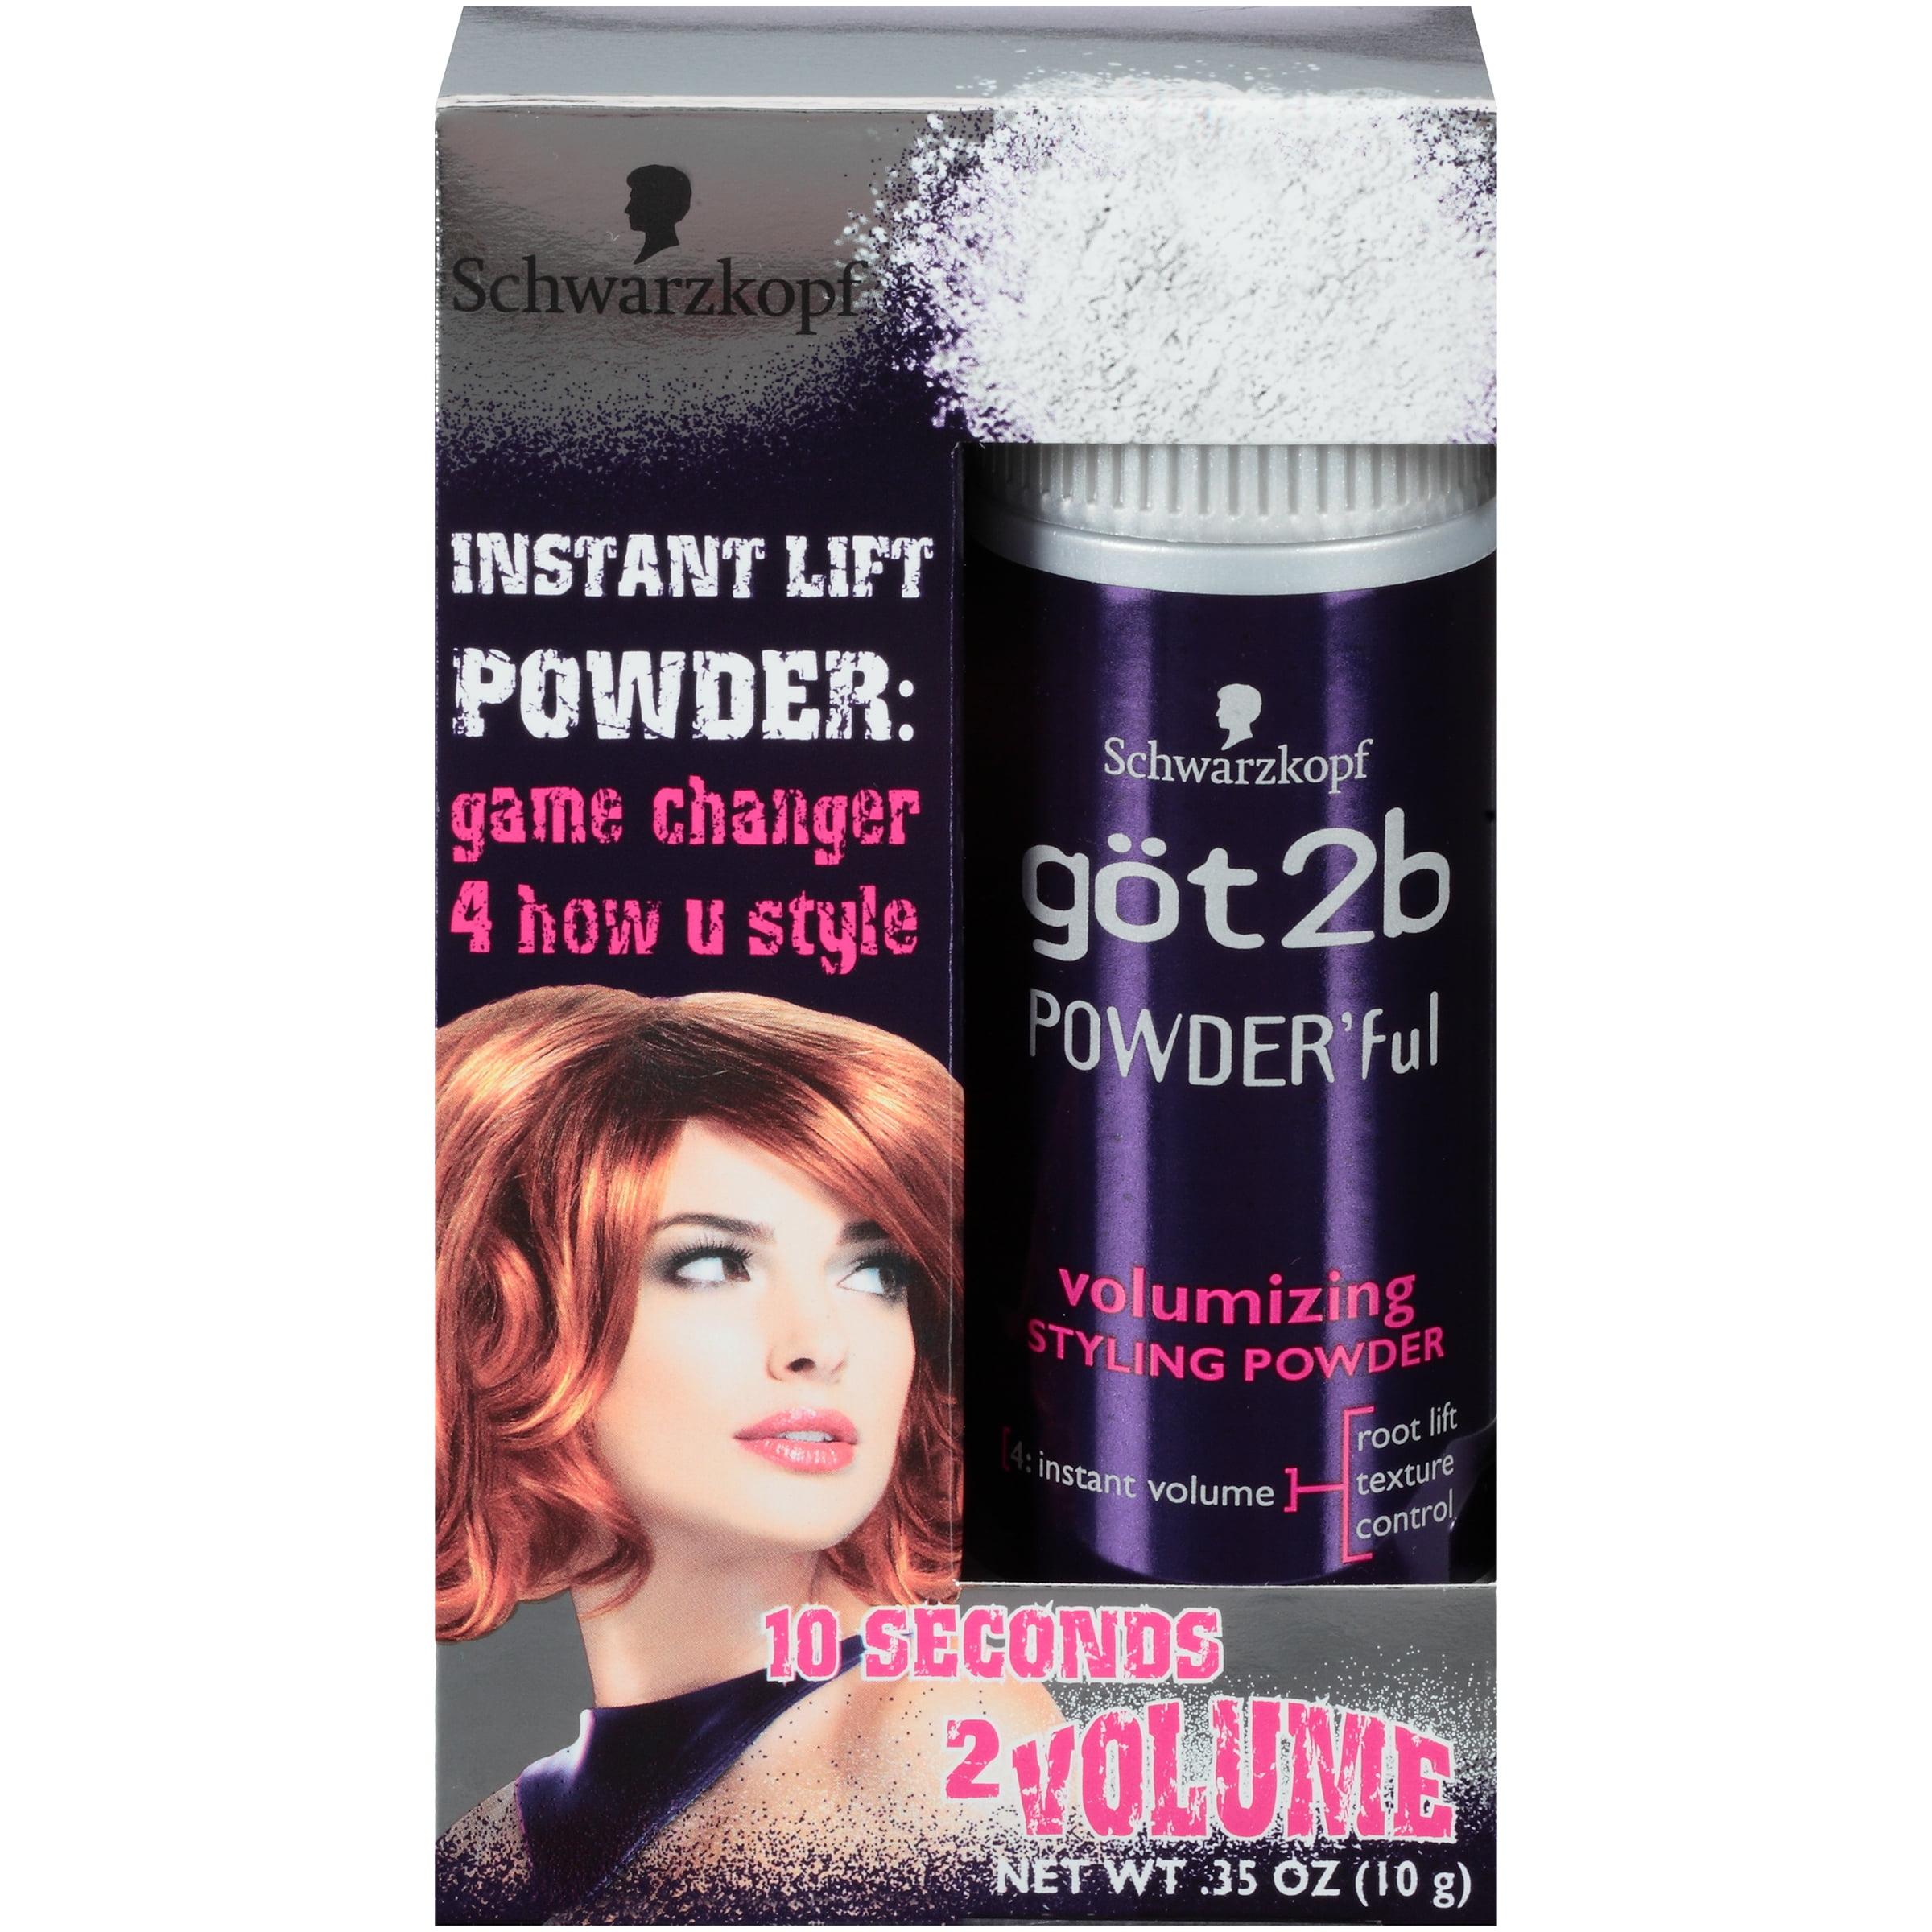 Got2b POWDER'ful Volumizing Hair Styling Powder 0.35 Ounce